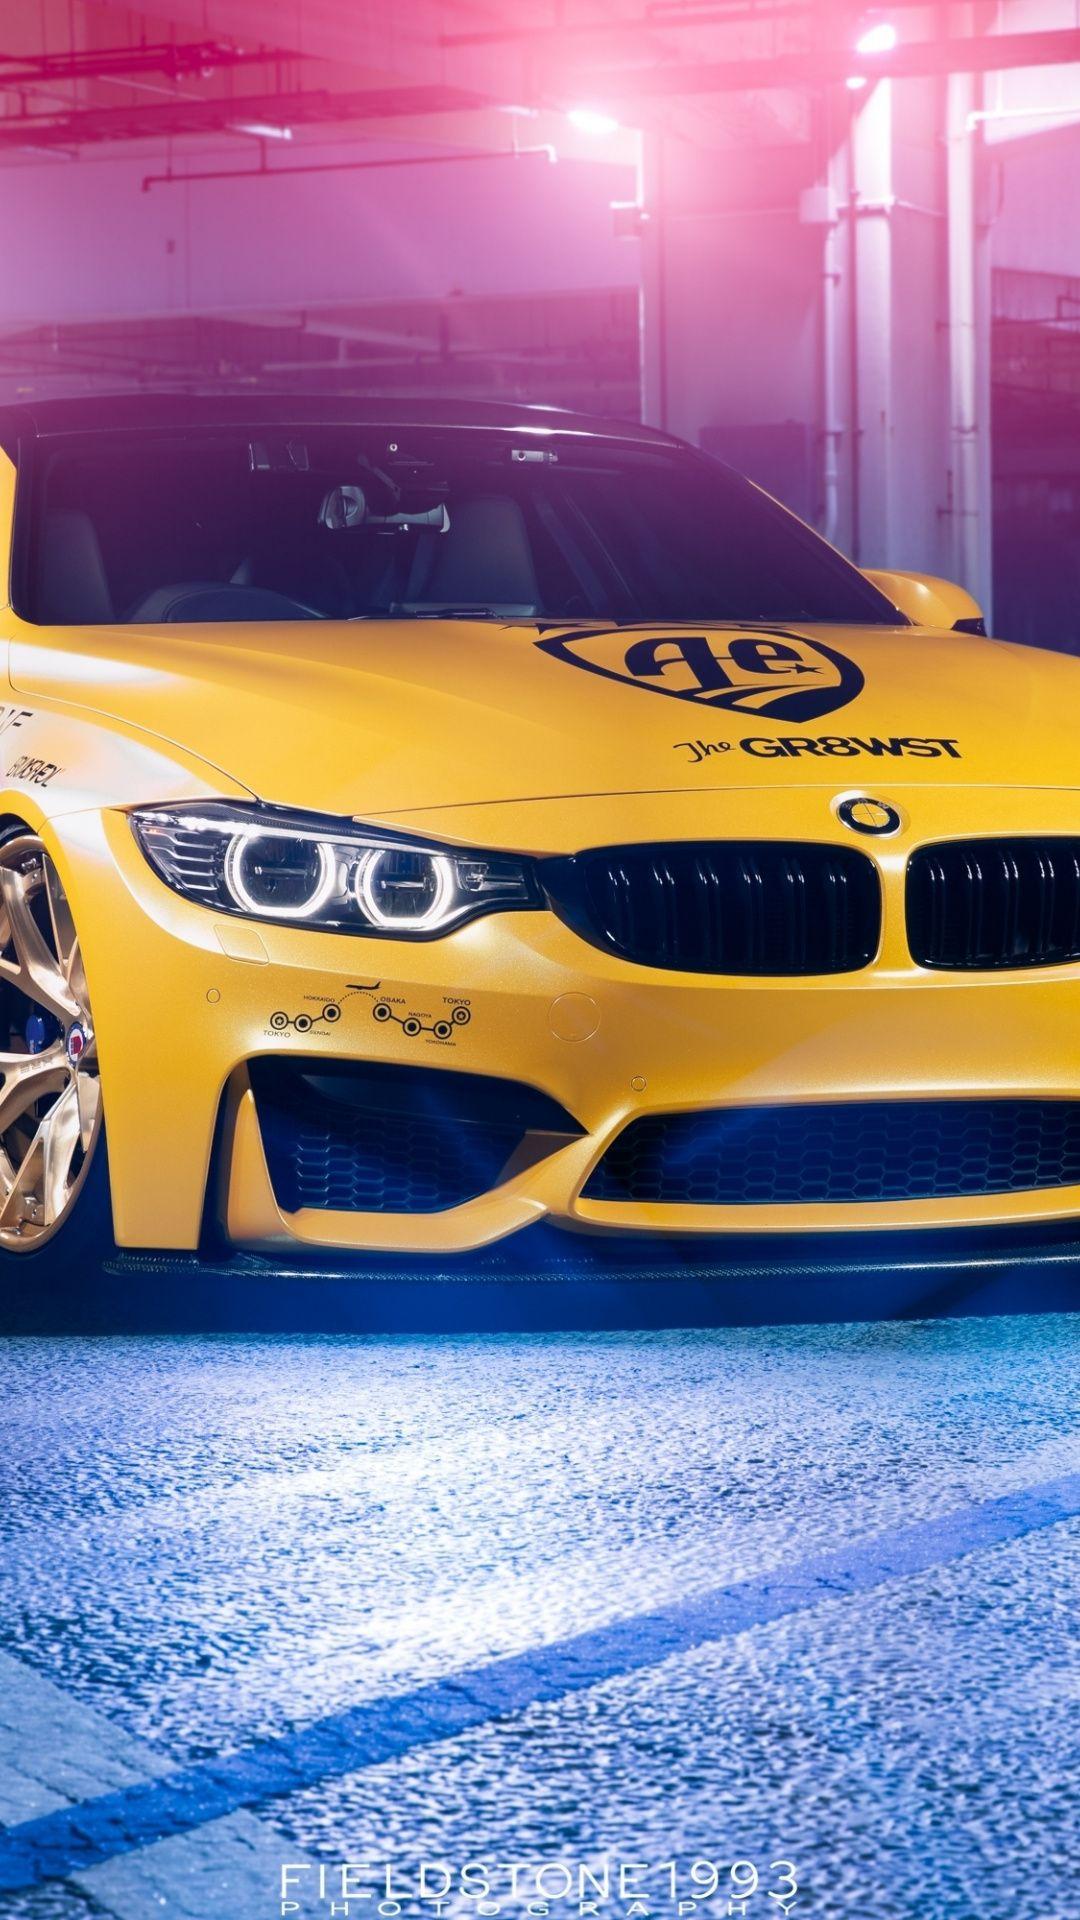 Bmw M4 Automotive Design Yellow 1080x1920 Wallpaper Automotive Design Bmw M4 Automotive